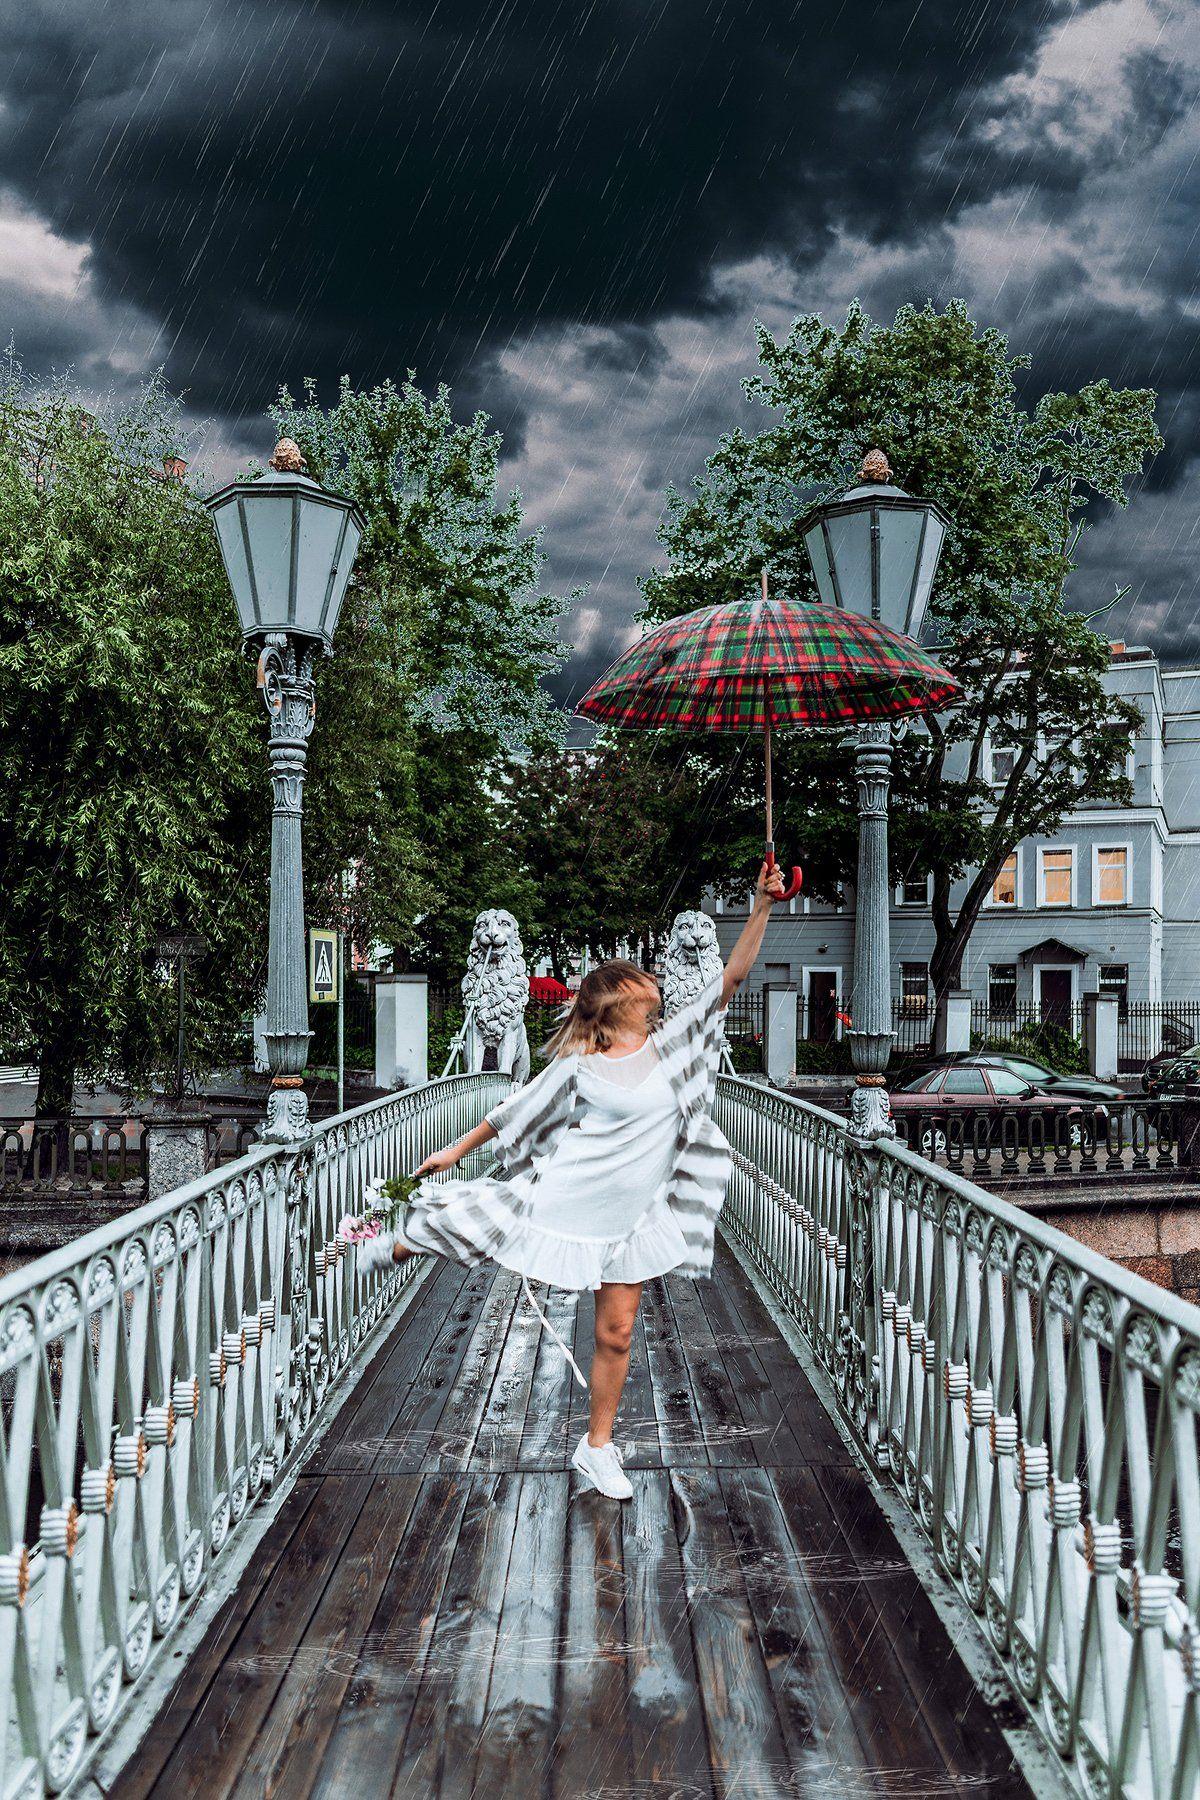 portrait, girl, girls, портрет, девушка, спб, питер, лето, Andrei Mikhailov